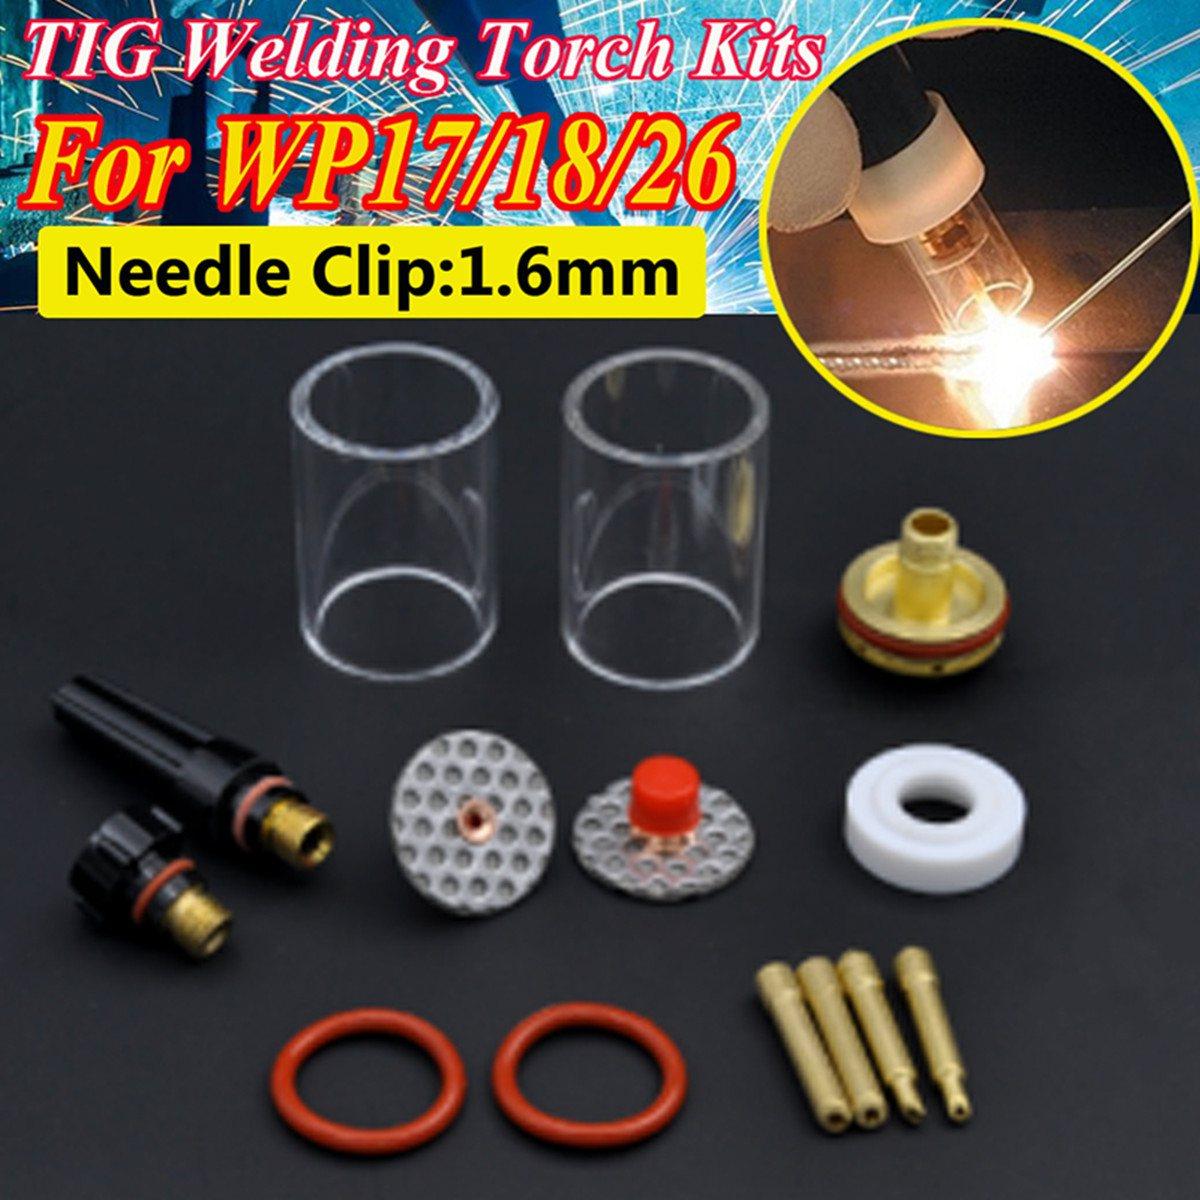 14PCS 1.6mm 1/16 TIG Welding Torch Stubby Gas Lens Glass Cup Kit For WP17/18/26 1set 14pcs tig welding torch stubby gas lens glass pyrex cup kit 3 2mm 1 8 for wp17 18 26 welding series